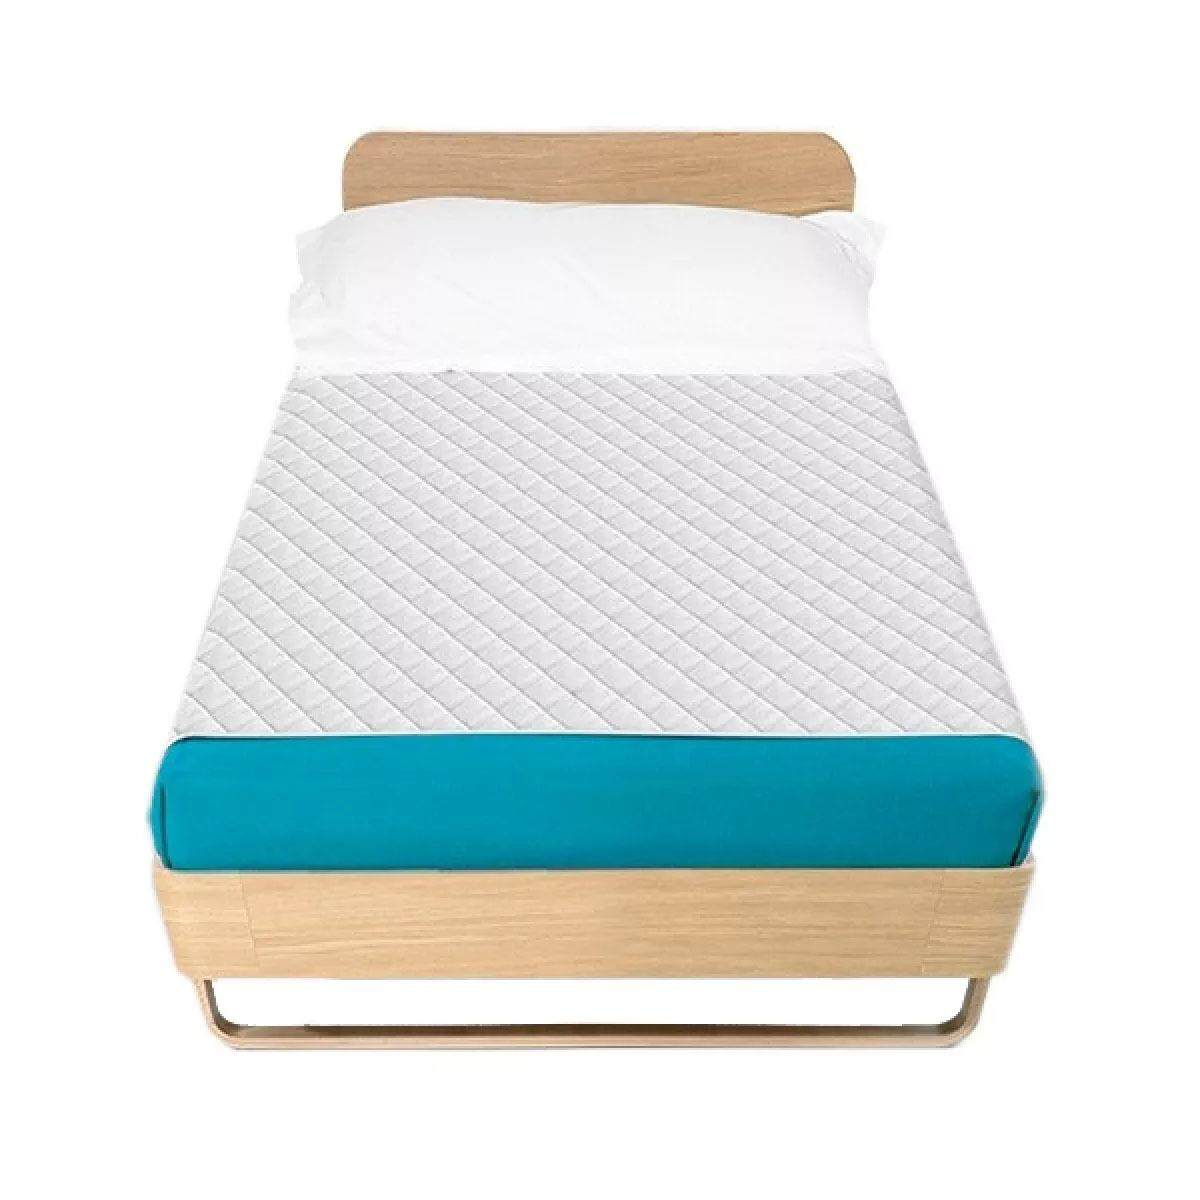 Supersorber ผ้ารองเตียงซับน้ำ Single Size พร้อมผ้าสอดใต้เตียง 105 x 140 ซม.